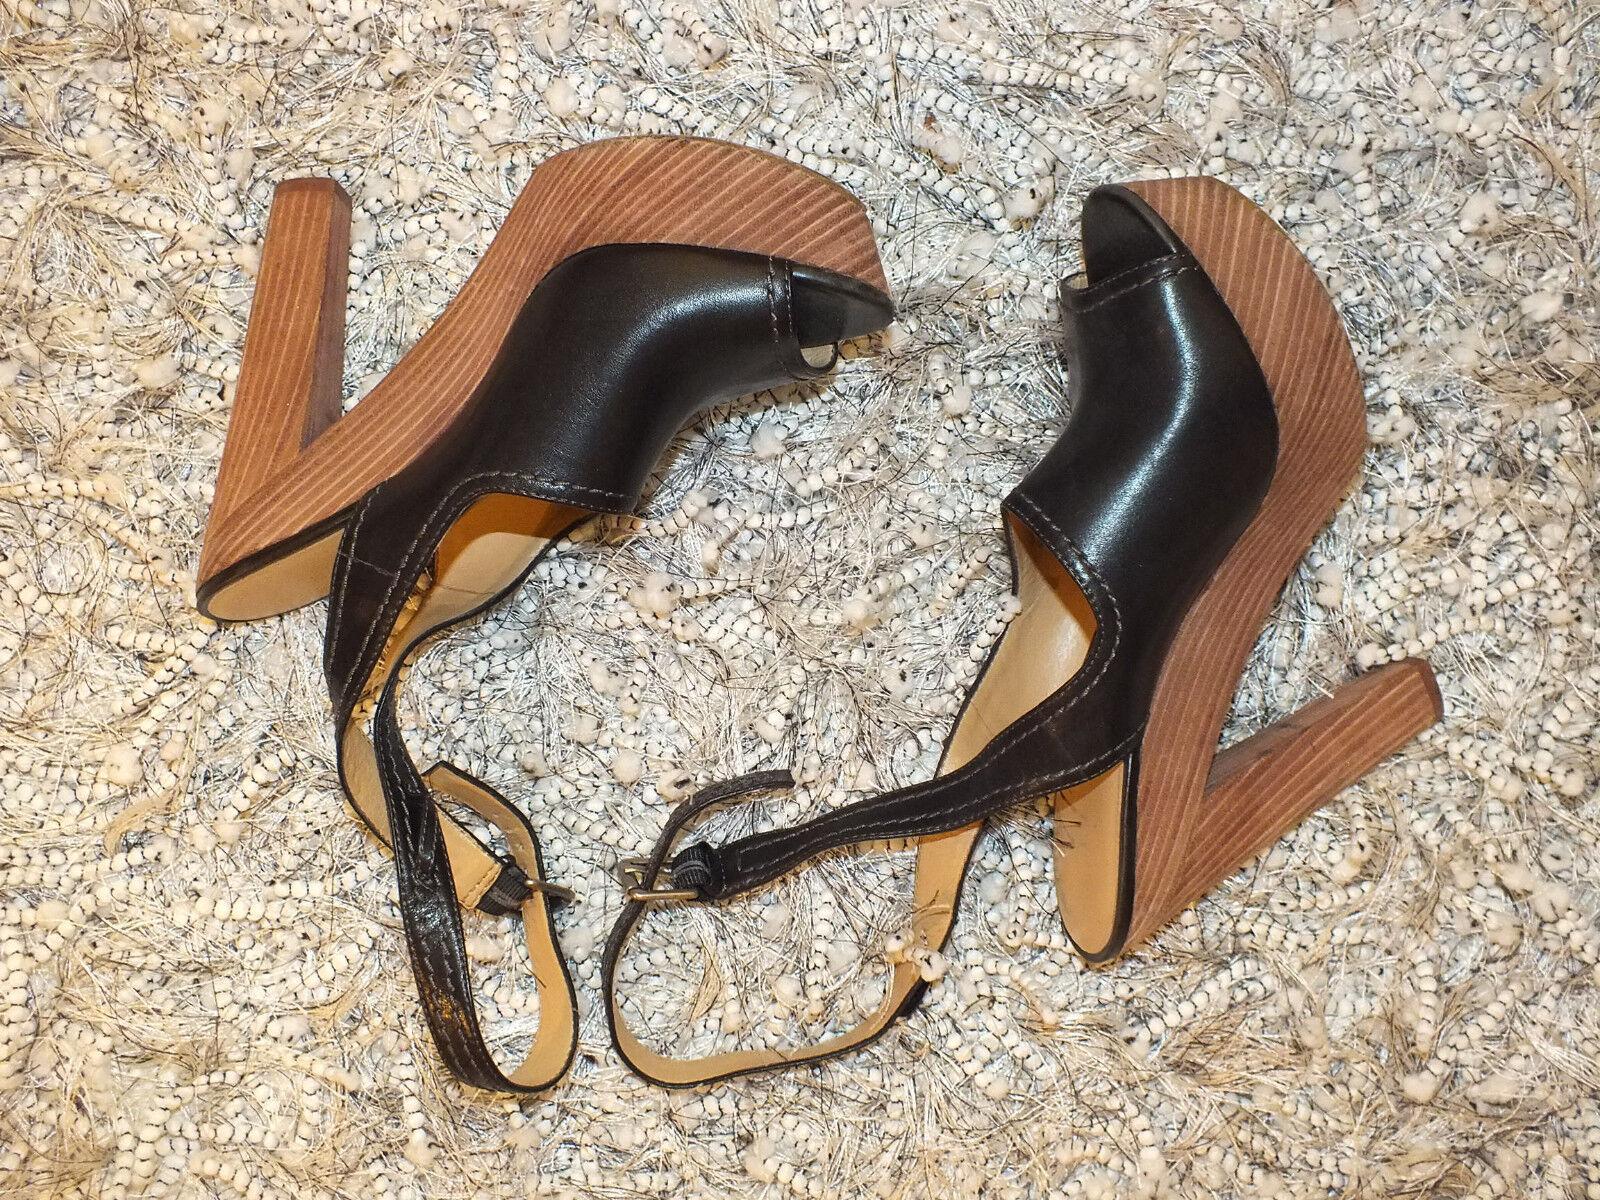 NINE WEST LEATHER WOODEN HIGH HEELs PLATFORM BLOCK STRAPPY Schuhe Sandales 8m